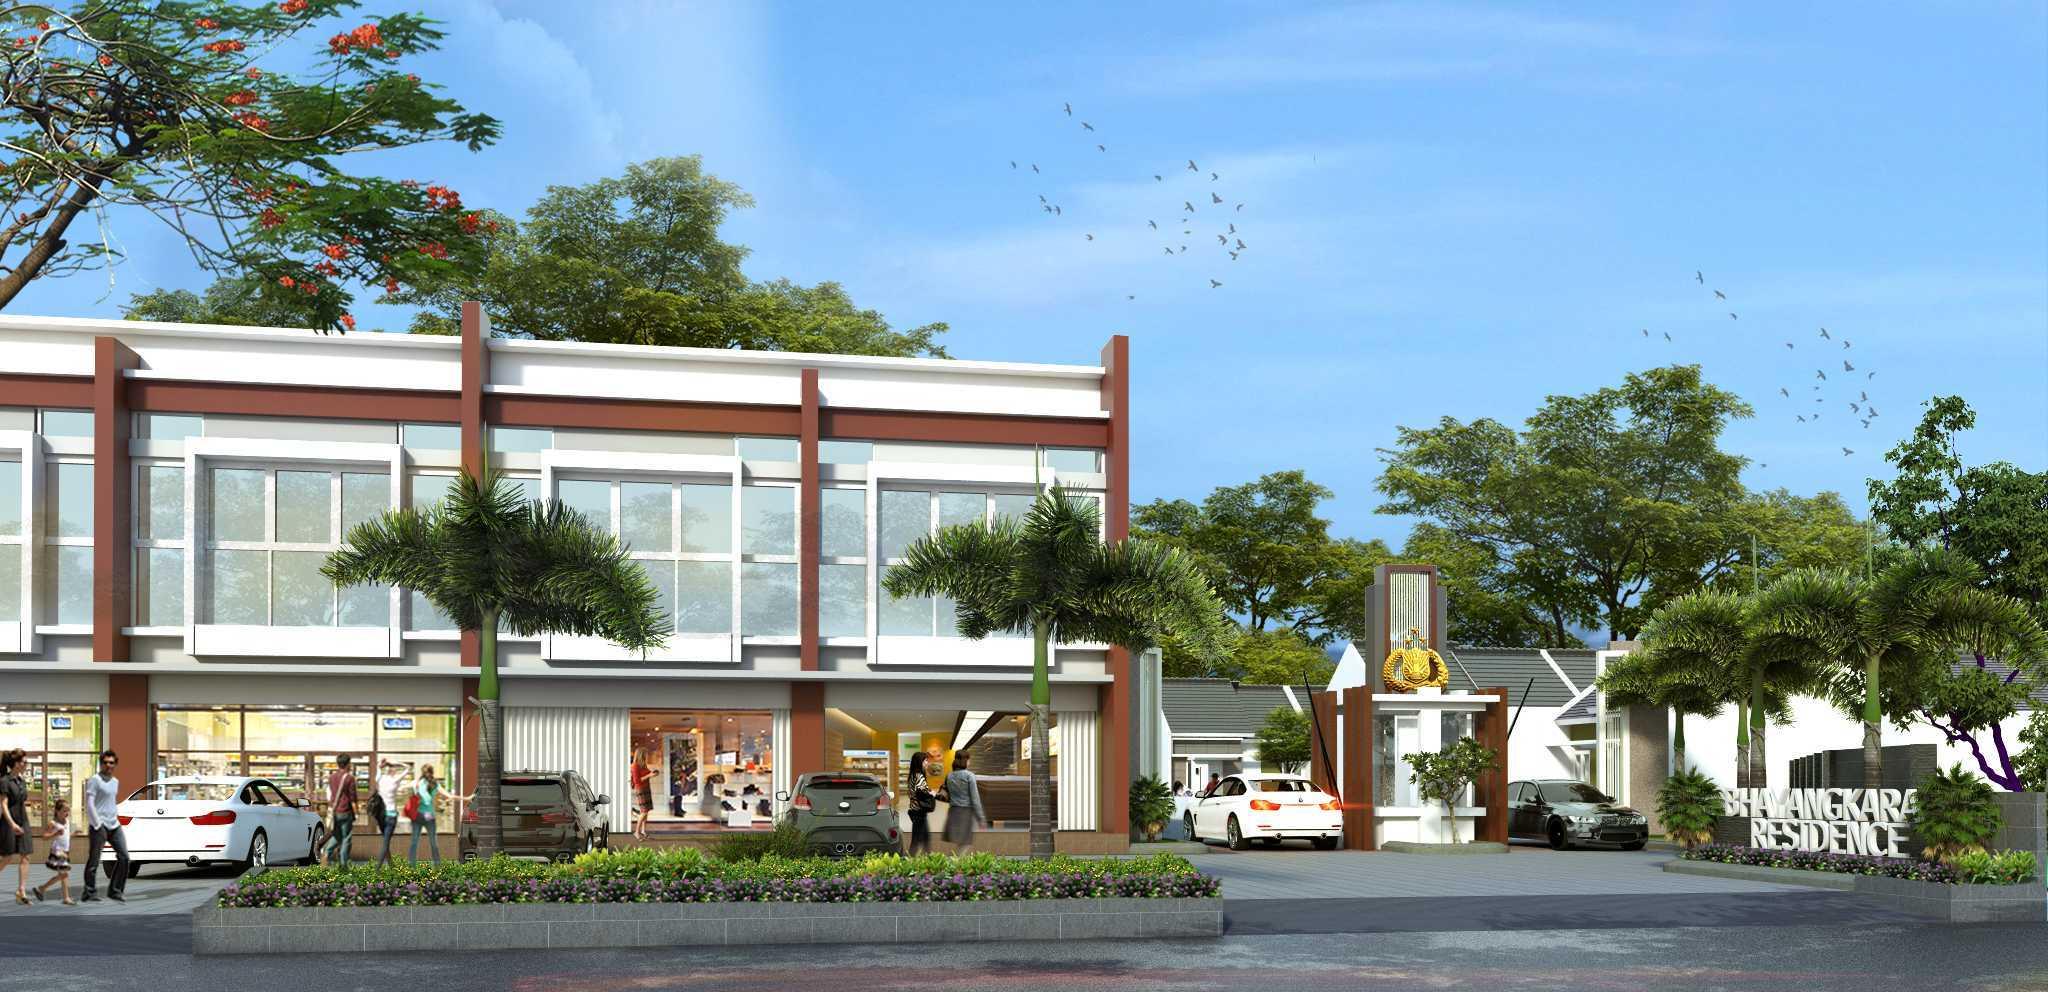 Arsatama Architect Bhayangkara Residence - Blora Blora, Central Java Blora, Central Java Gate-Bhayangkara13 Modern  23408